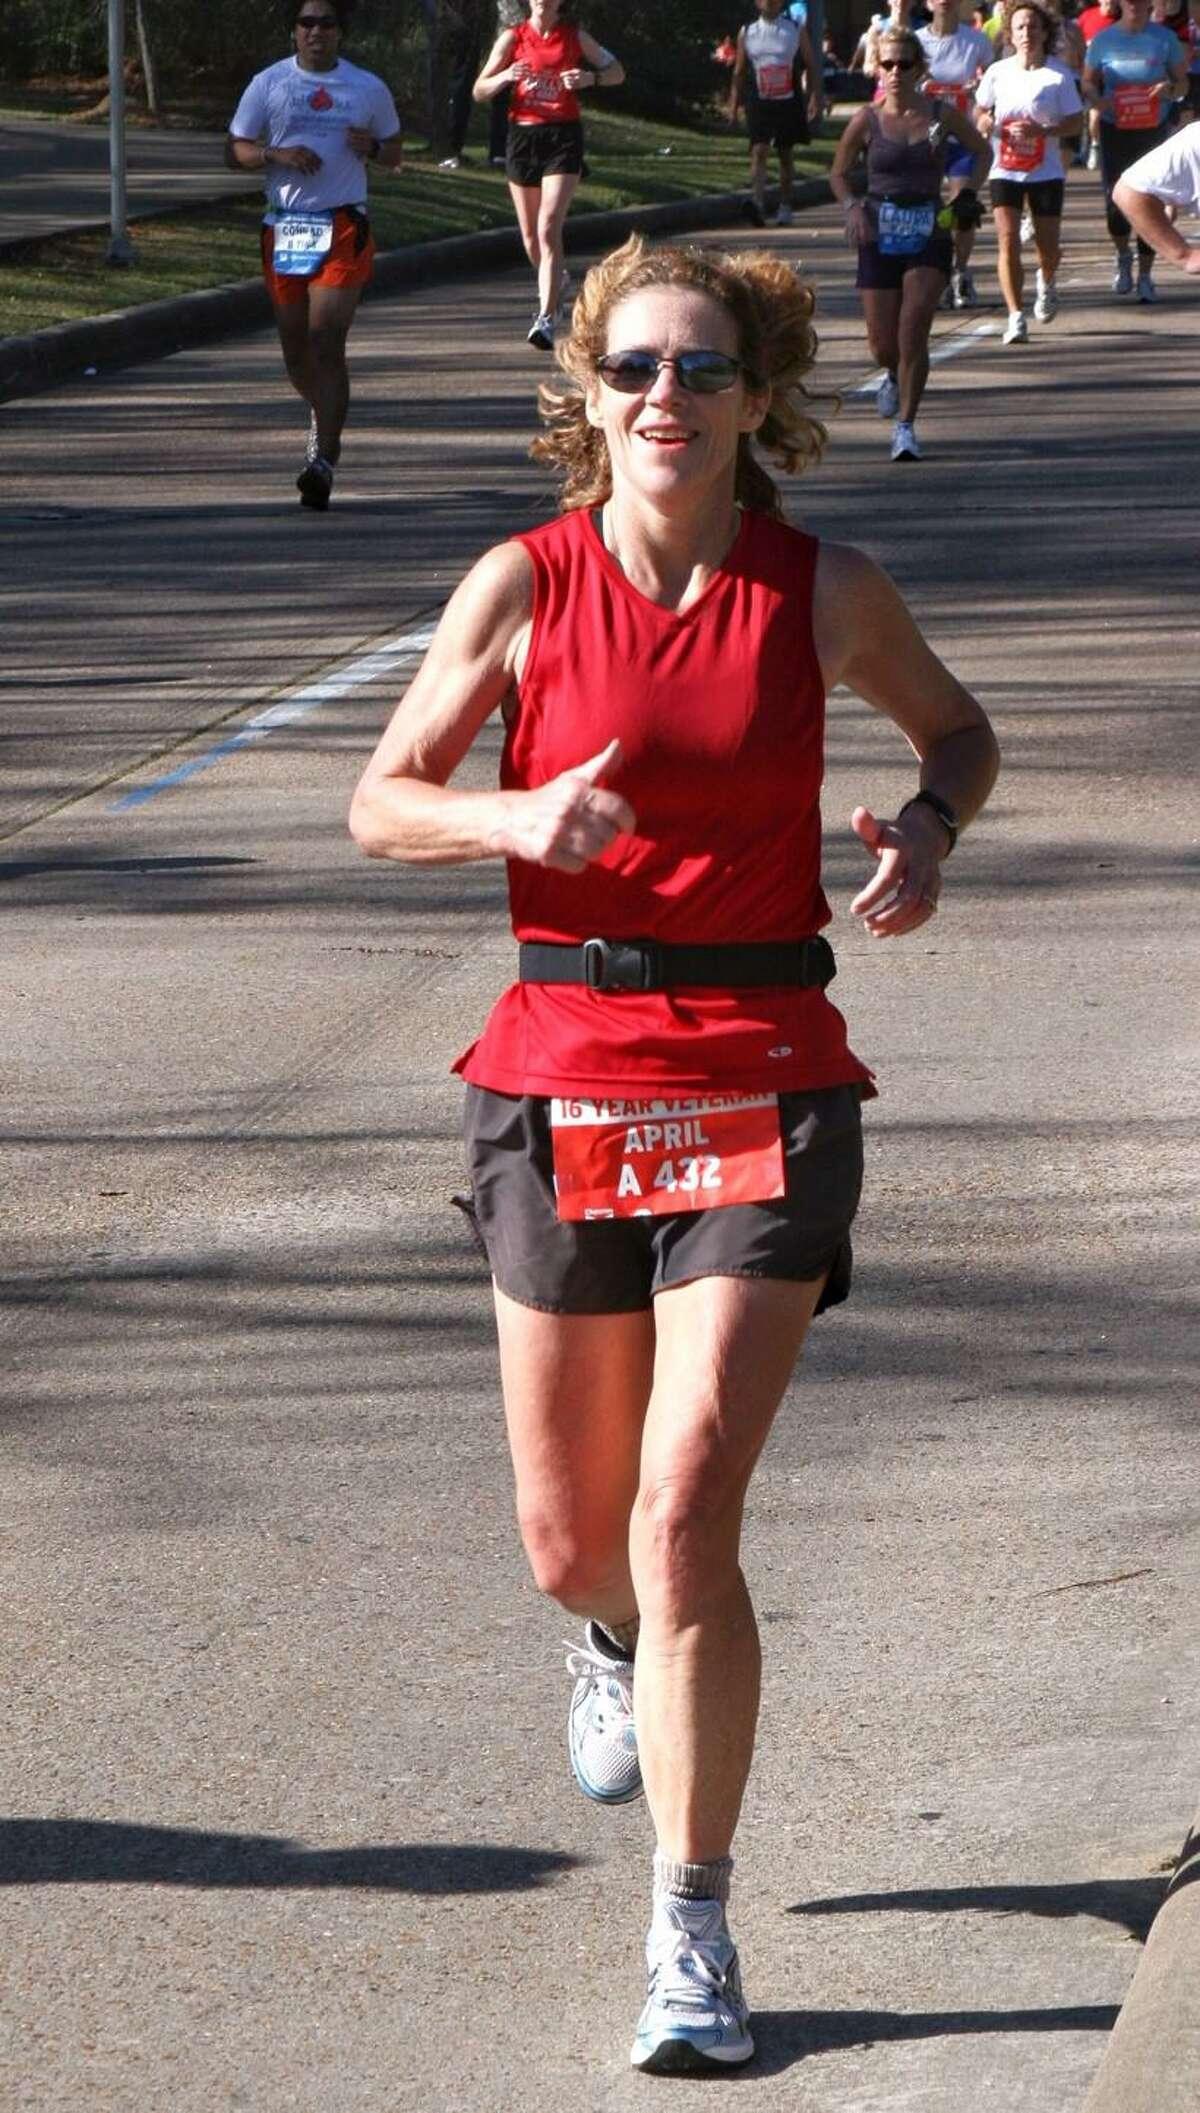 April Murphy, a Houston artist, has run 75 marathons and 20 Houston Marathons. She will return to running Houston after a seven year hiatus in January 2020.